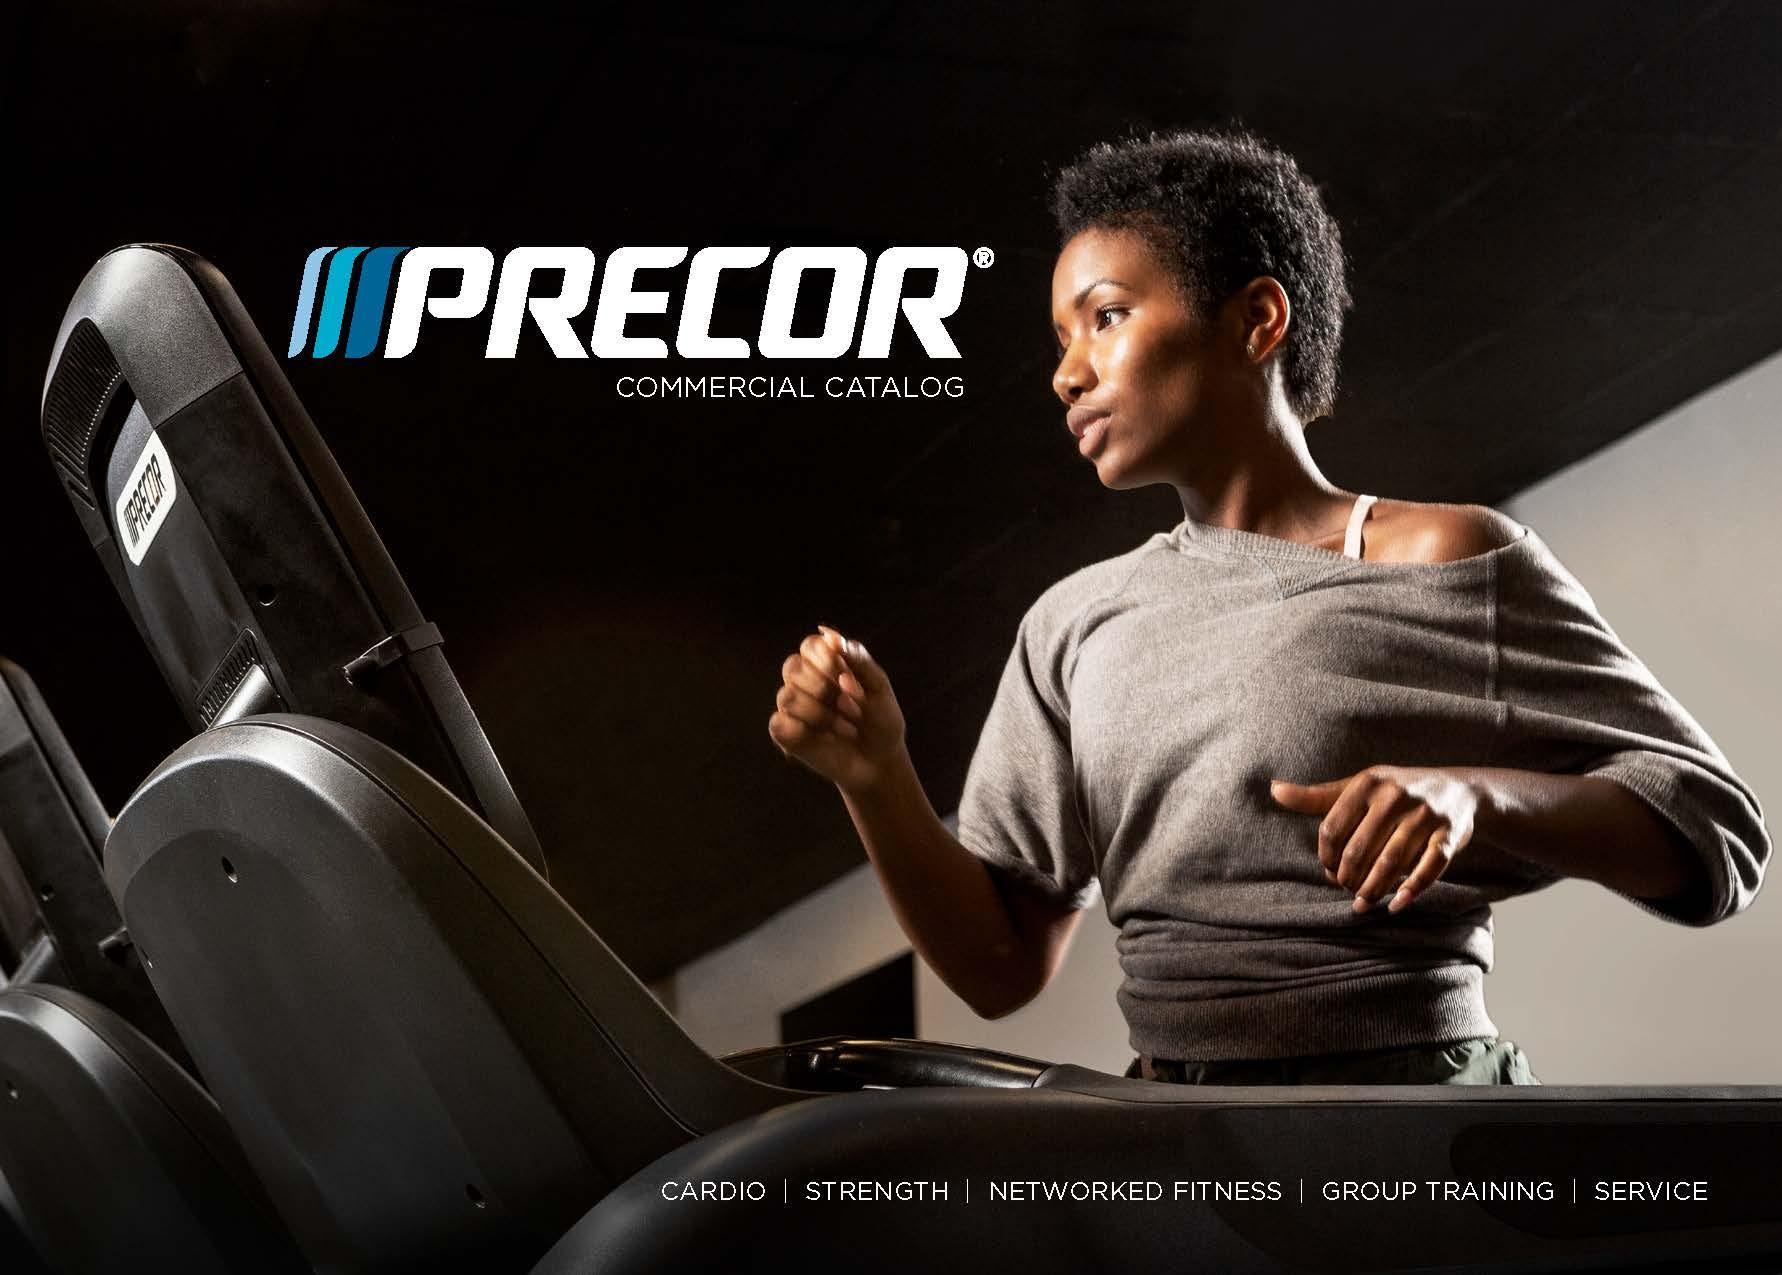 Precor-2019-Catalog-Cardio_Page_01.jpg